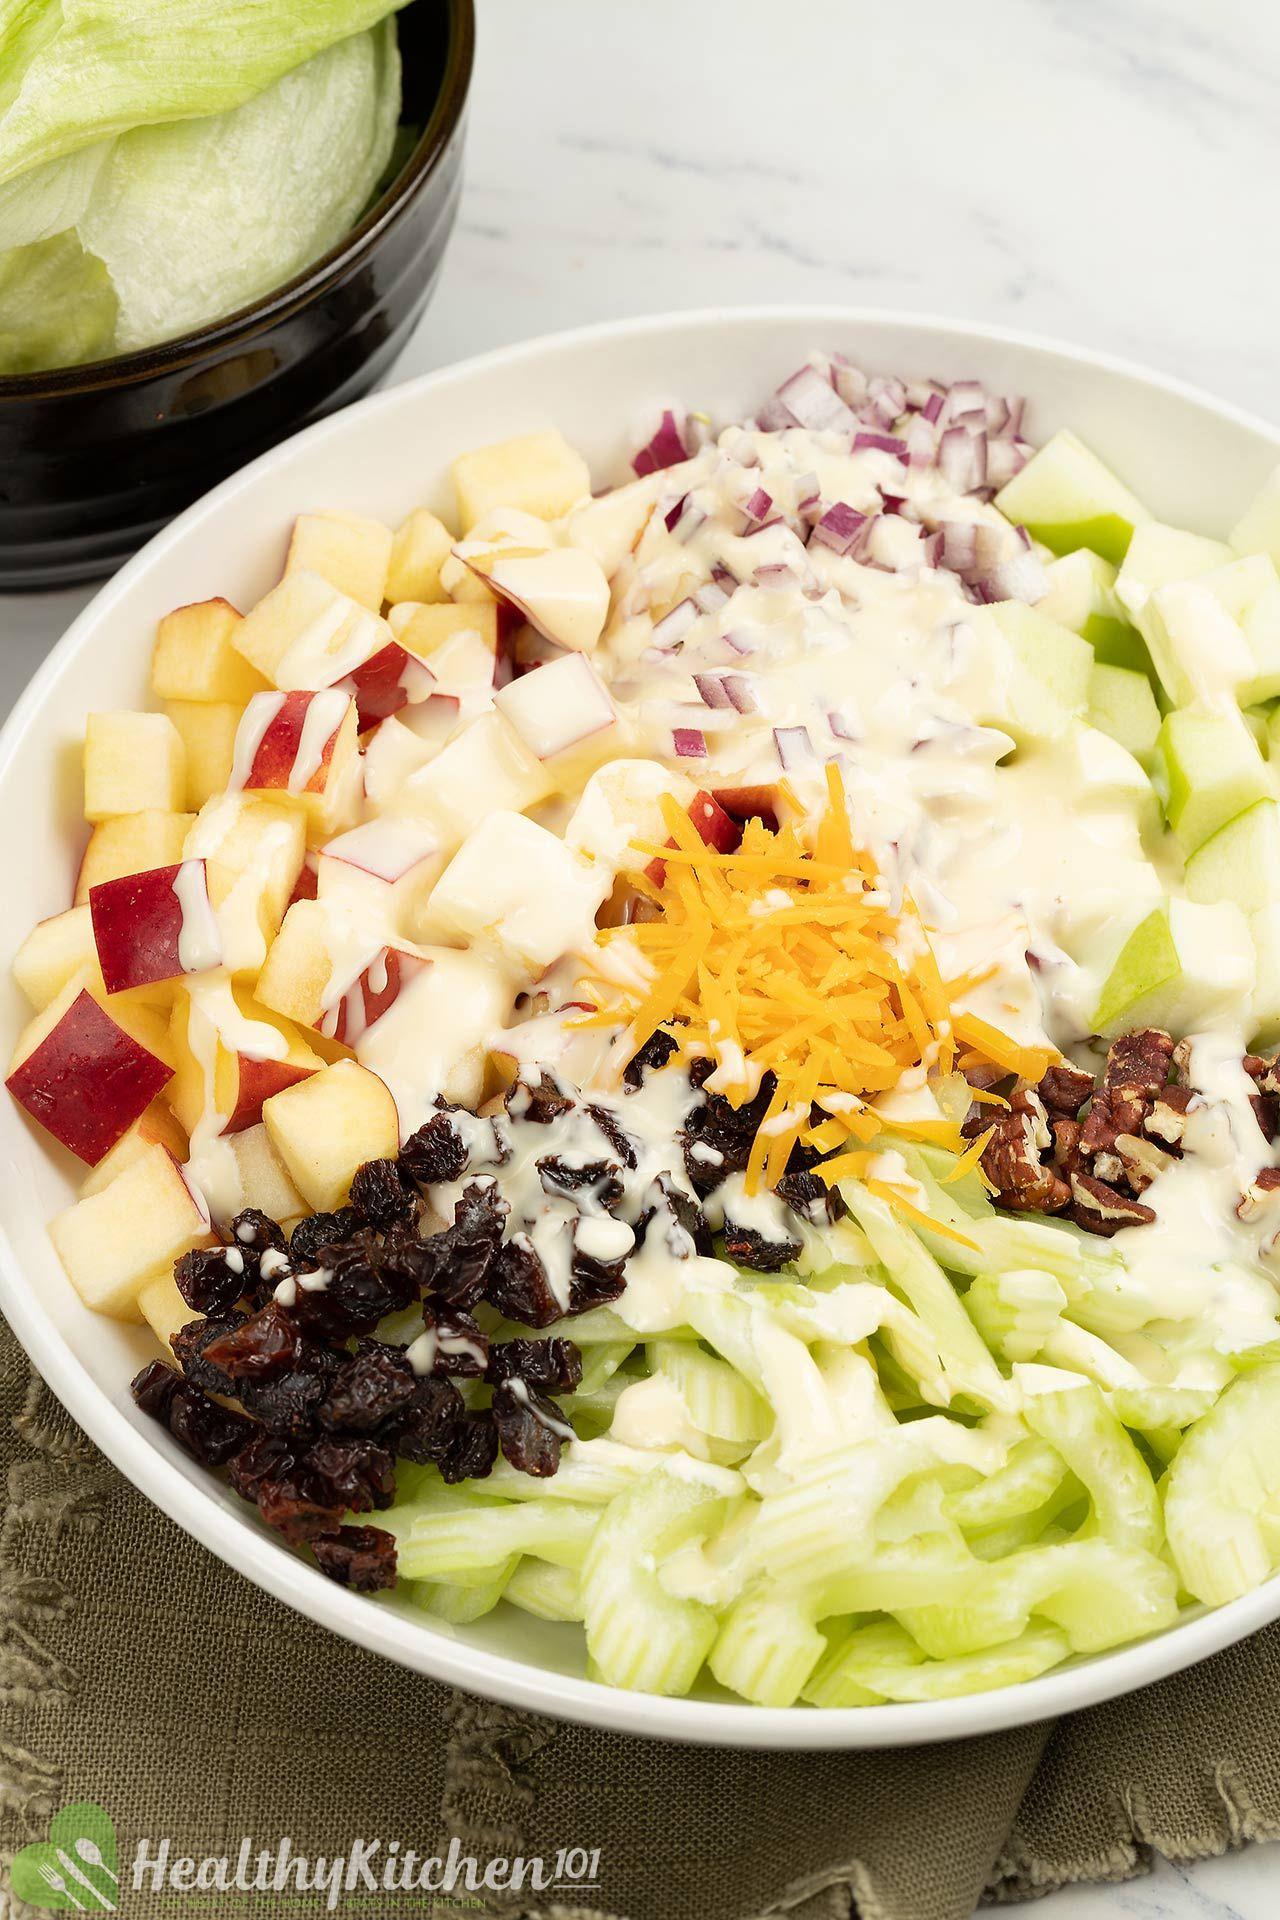 Is Apple Salad Healthy